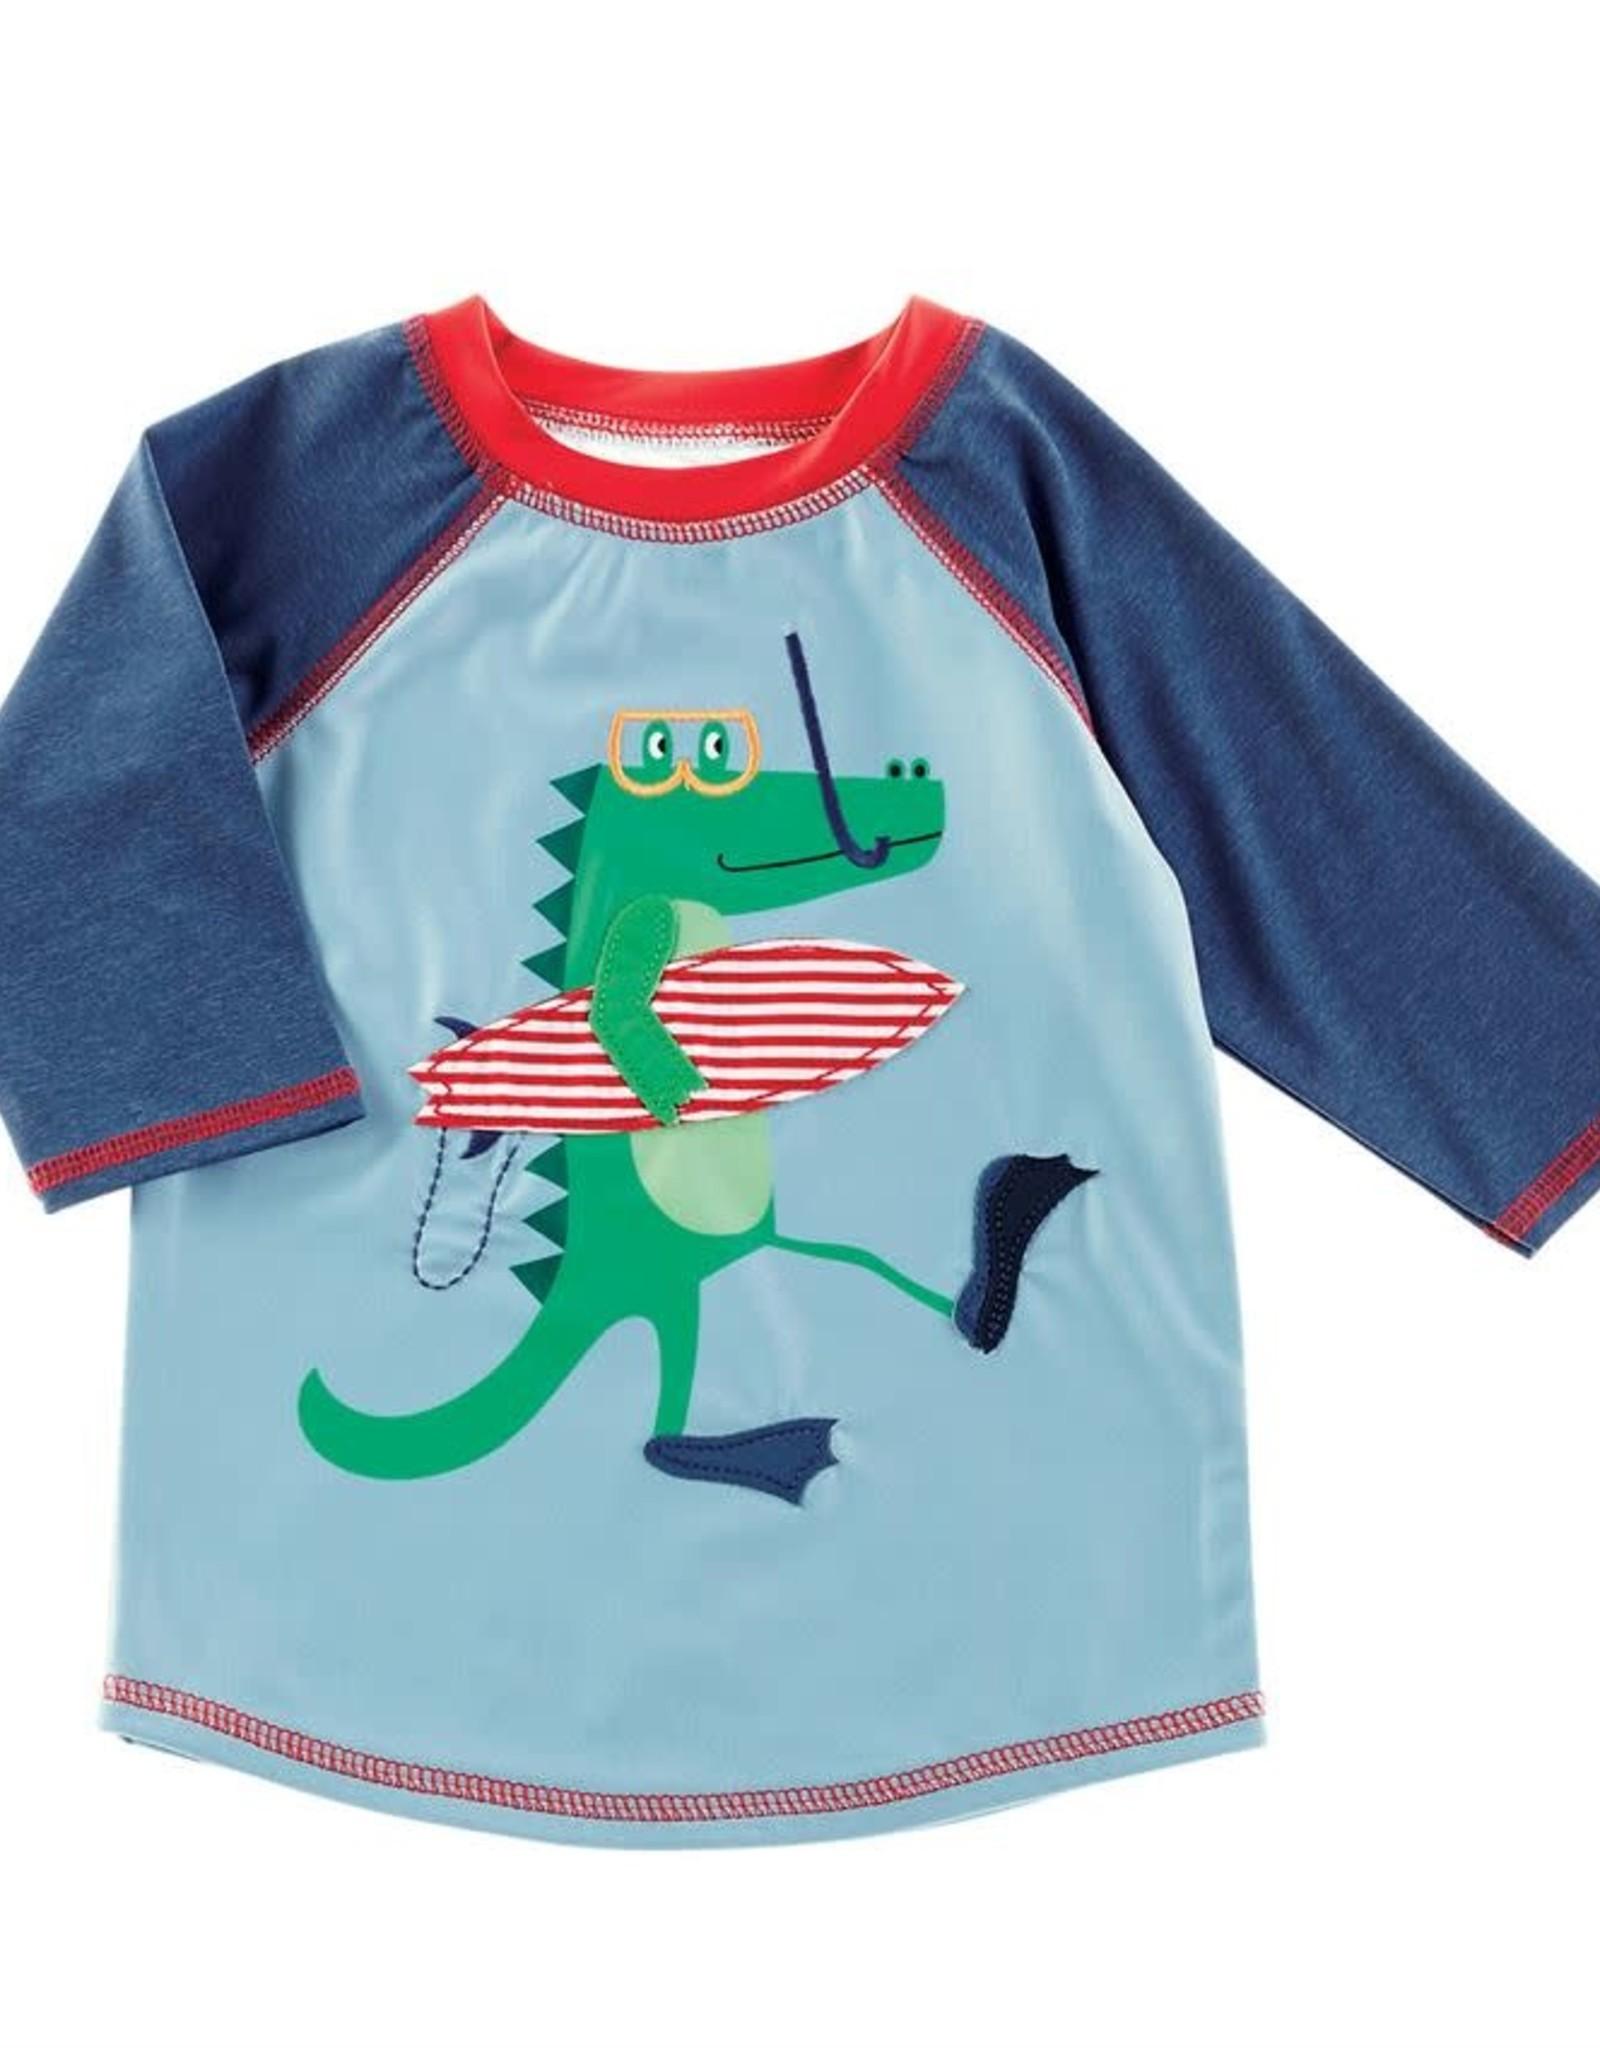 Alligator swim trunks w/rashguard